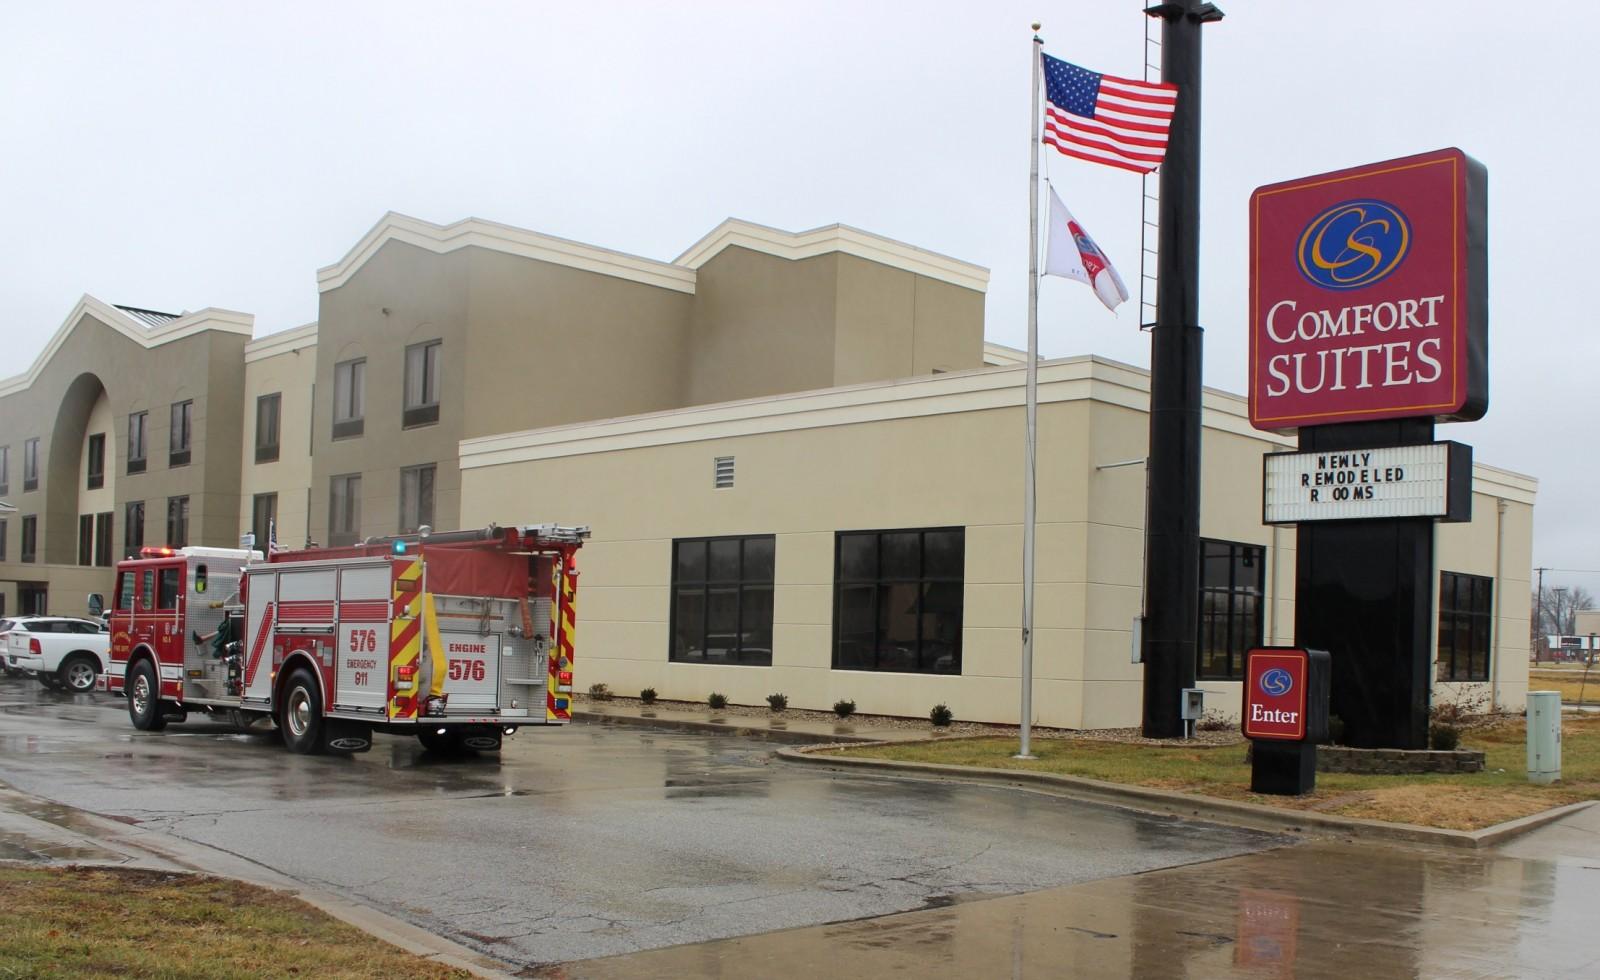 The Effingham Fire Department investigates a fire alarm at Comfort Suites.